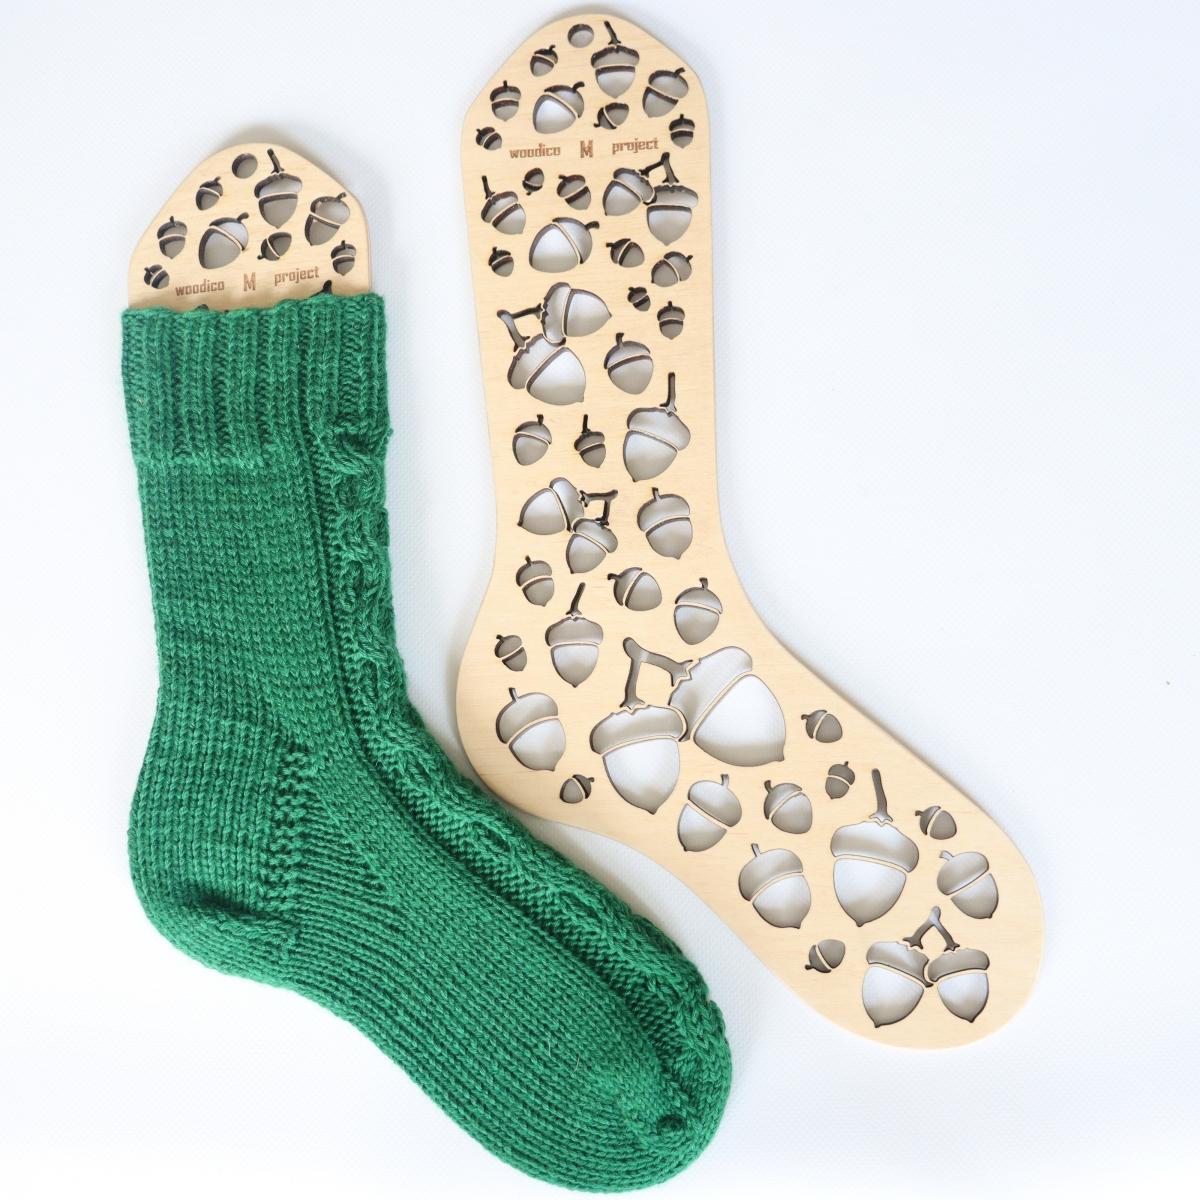 woodico.pro wooden sock blockers acorns 1200x1200 - Wooden sock blockers / Acorns